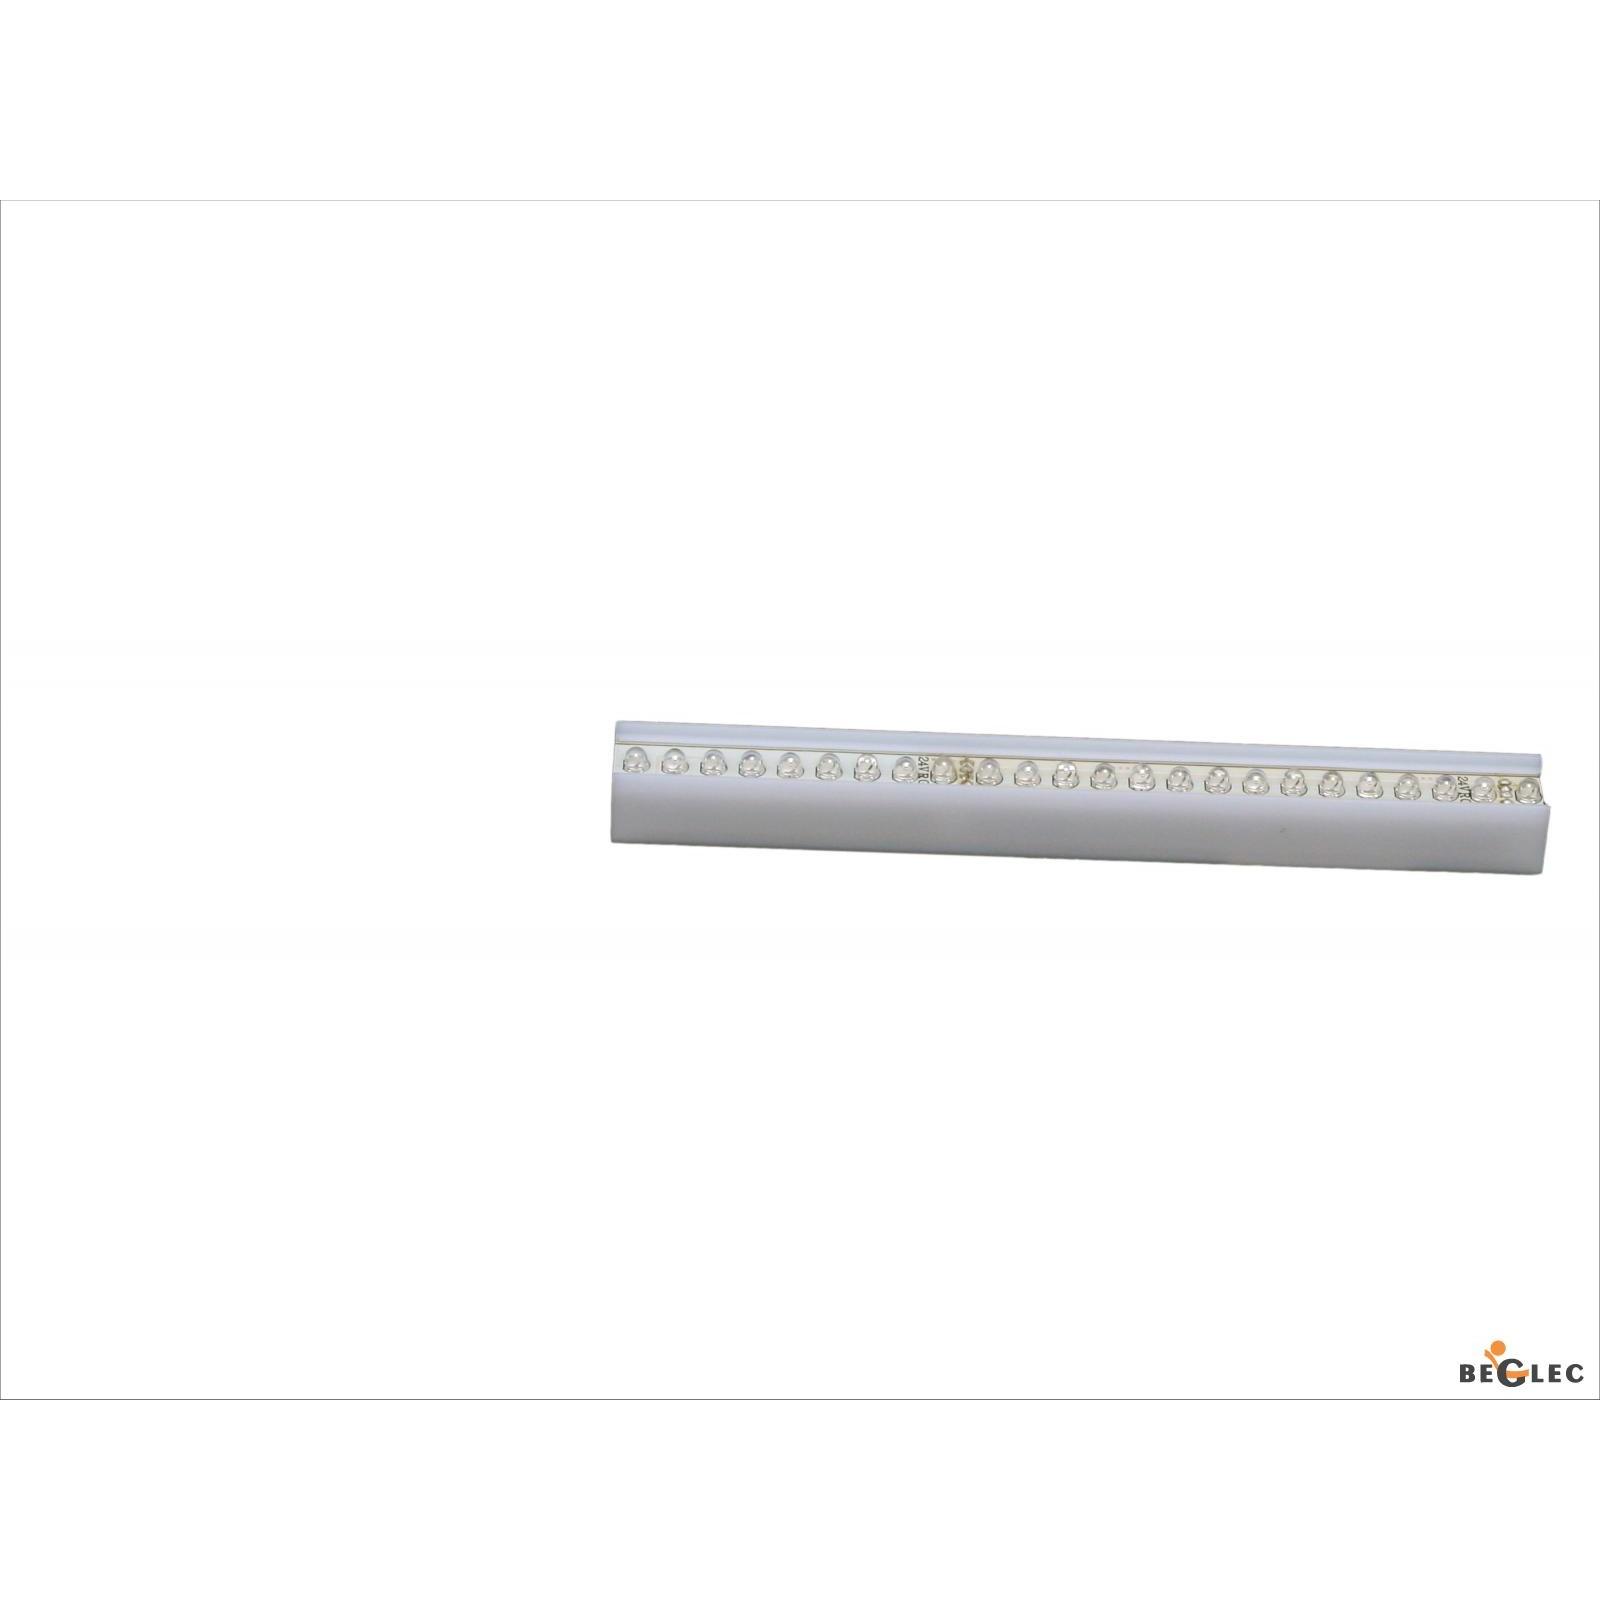 jb systems mls 20 mini led strip licht architektur dekorativ. Black Bedroom Furniture Sets. Home Design Ideas